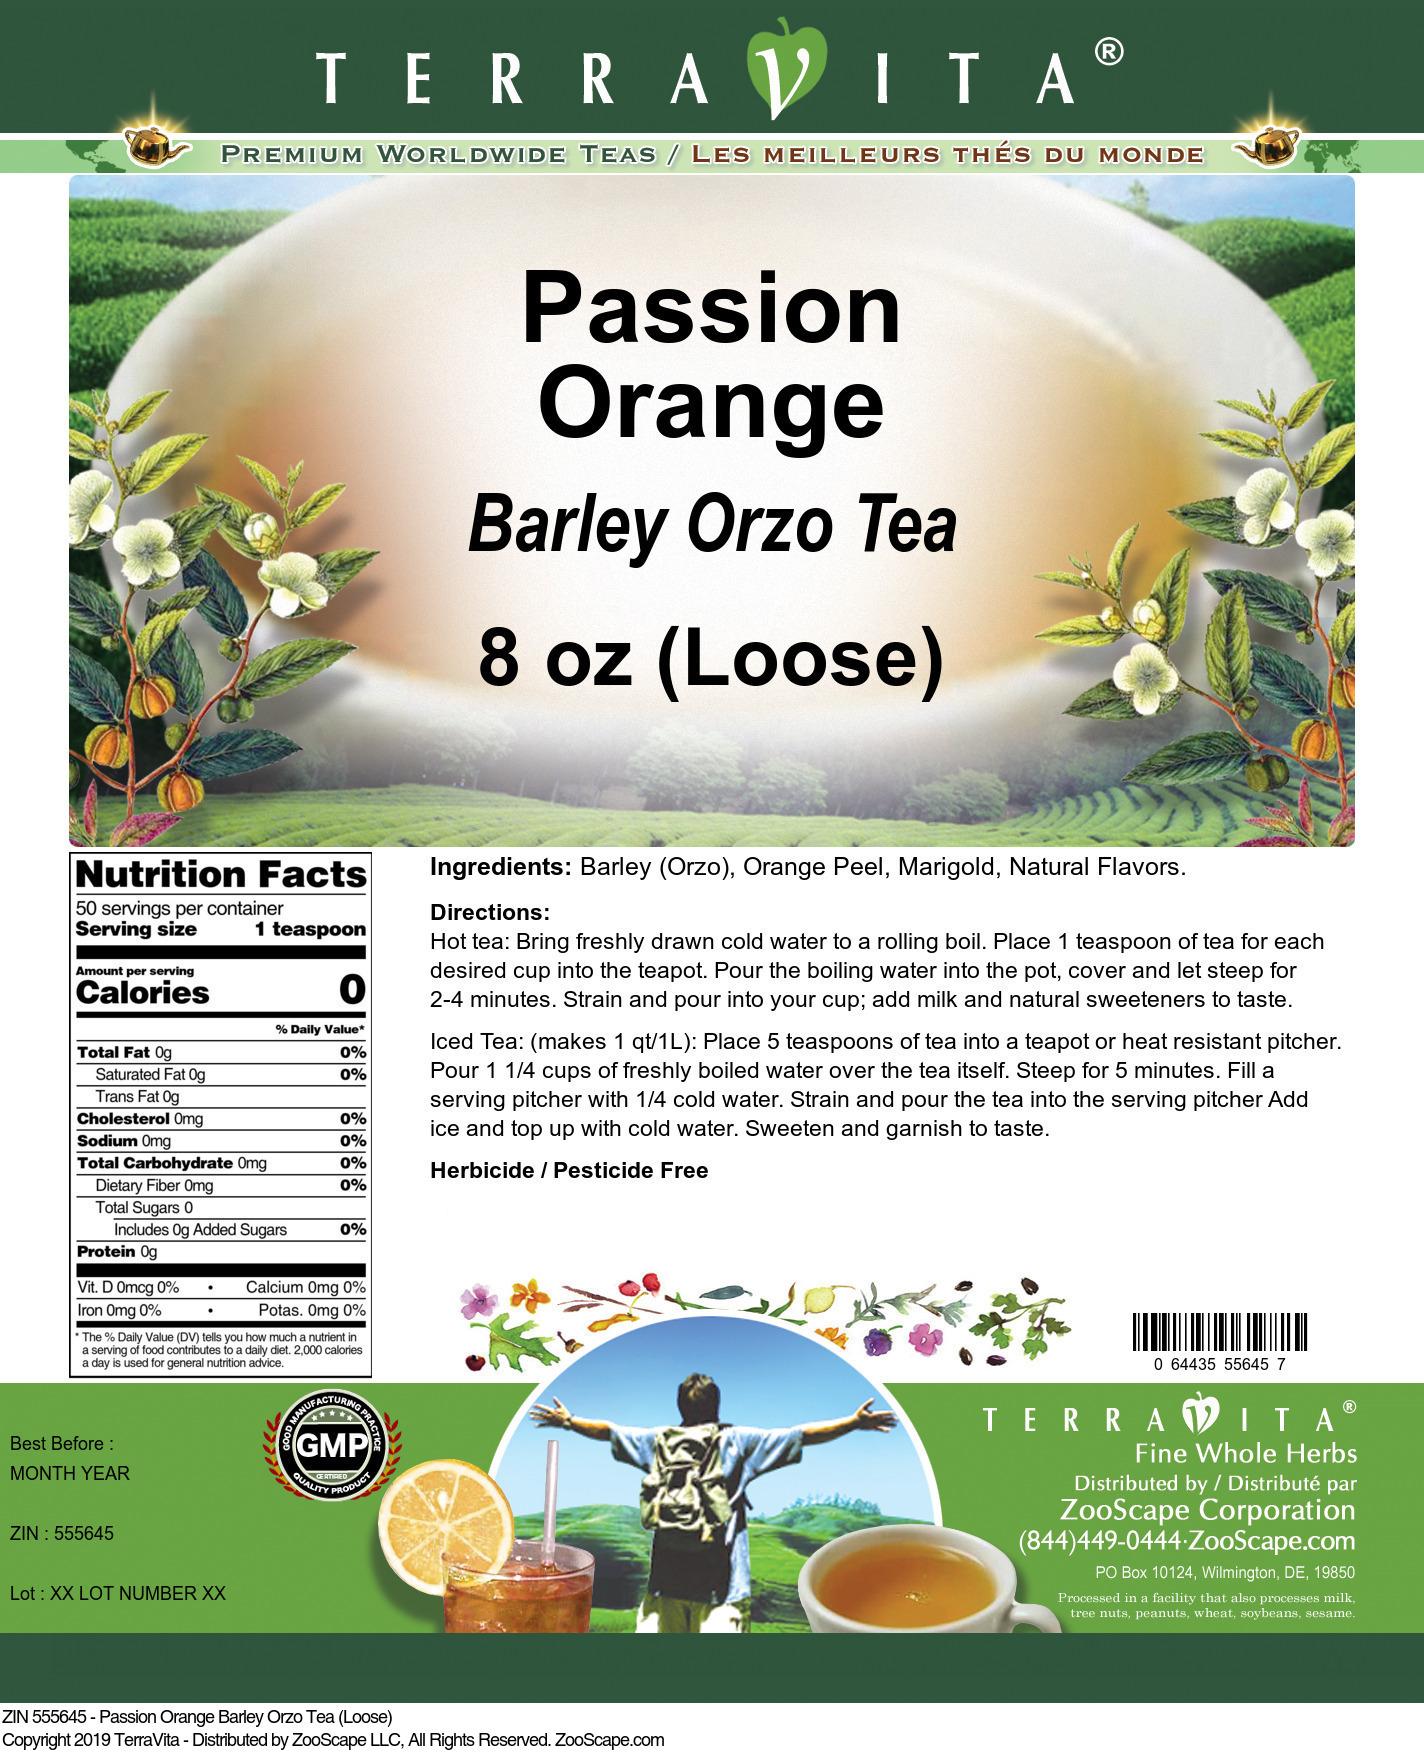 Passion Orange Barley Orzo